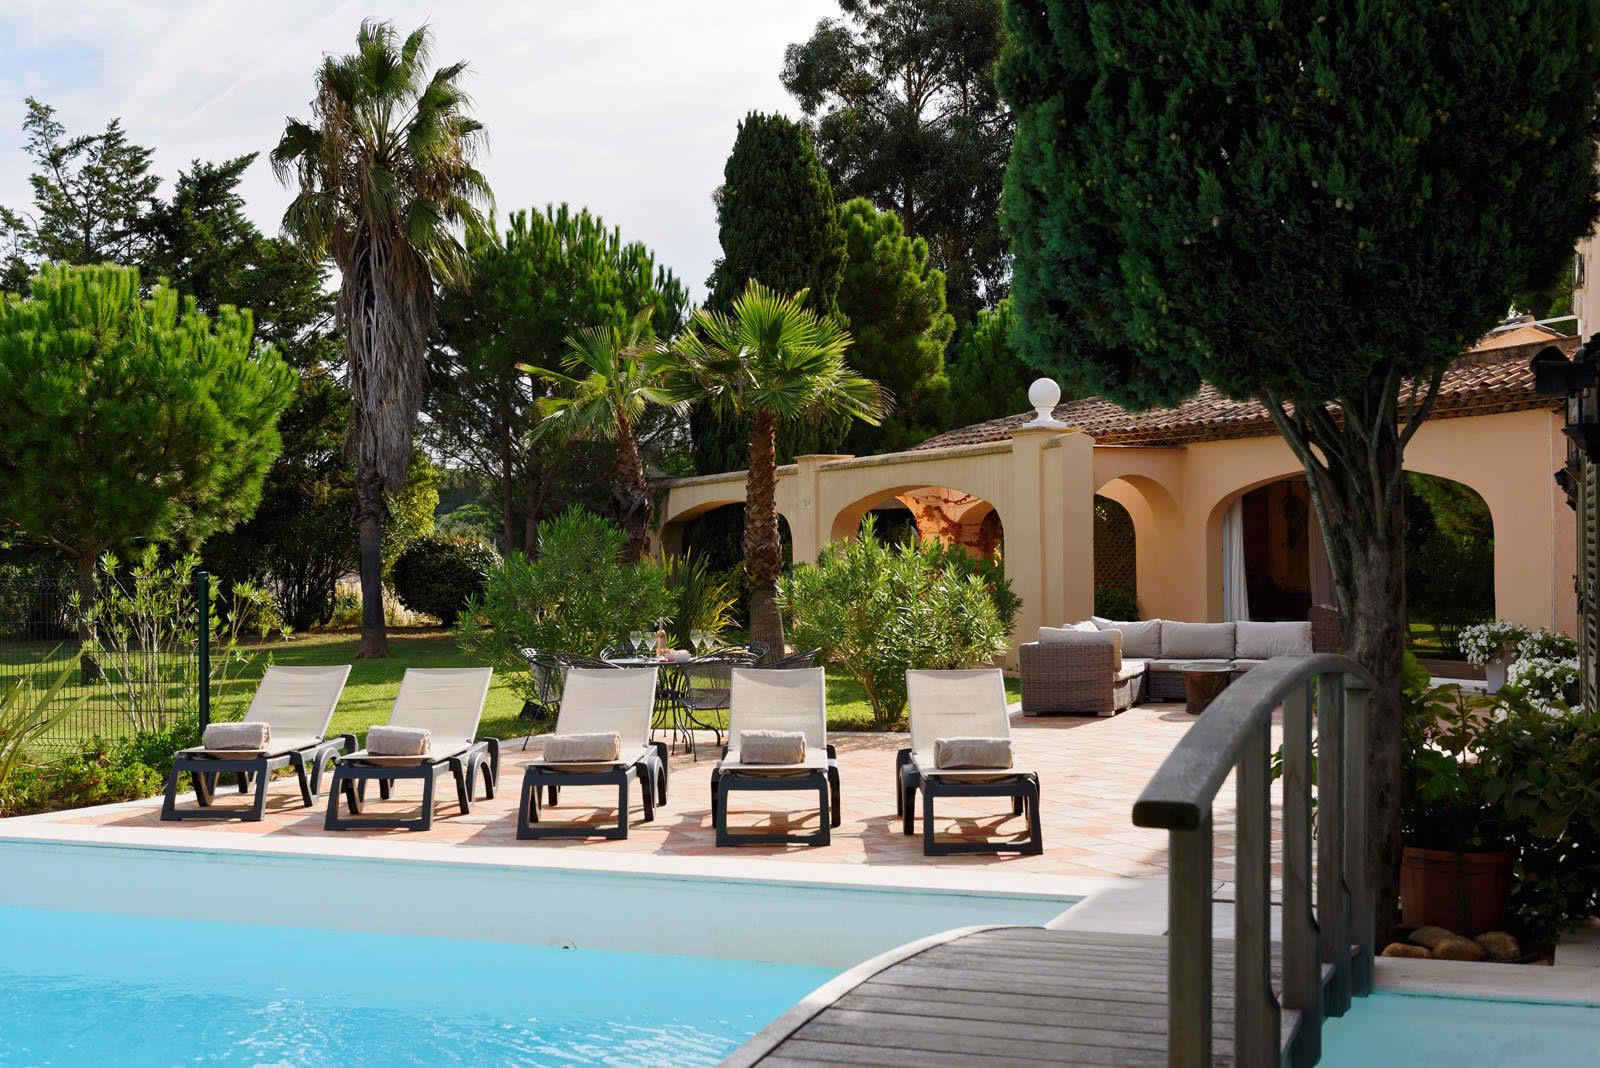 villa-piscine-a-louer-ramatuelle-jardin-terrasses-studio-garages